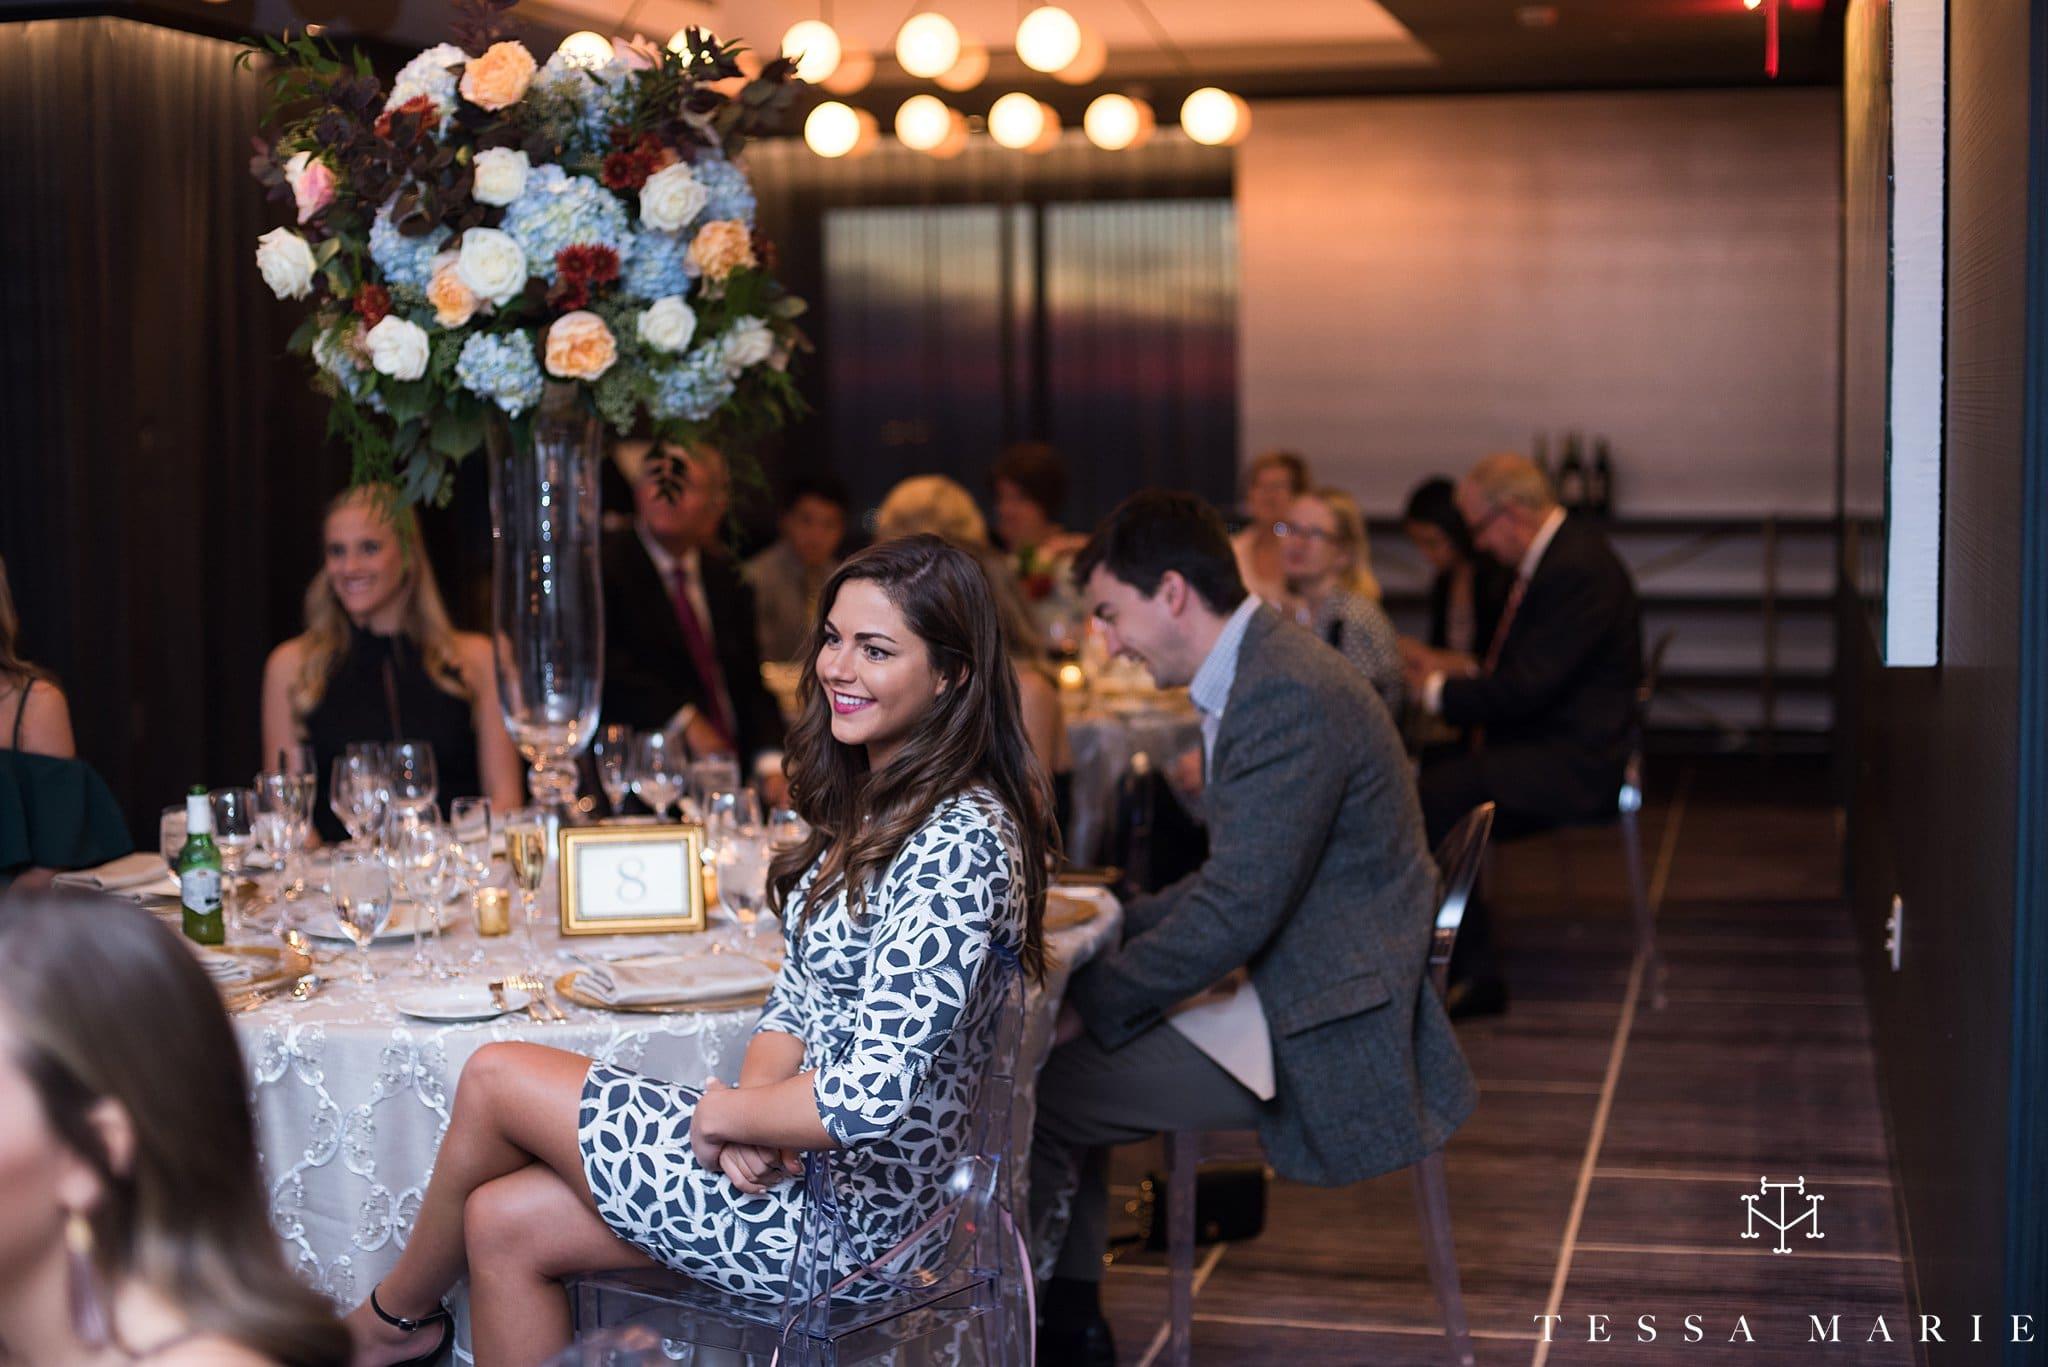 tessa_marie_Weddings_four_seasons_rehersal_dinner_pictures_wedding_atlanta_wedding_getting_married_0033.jpg